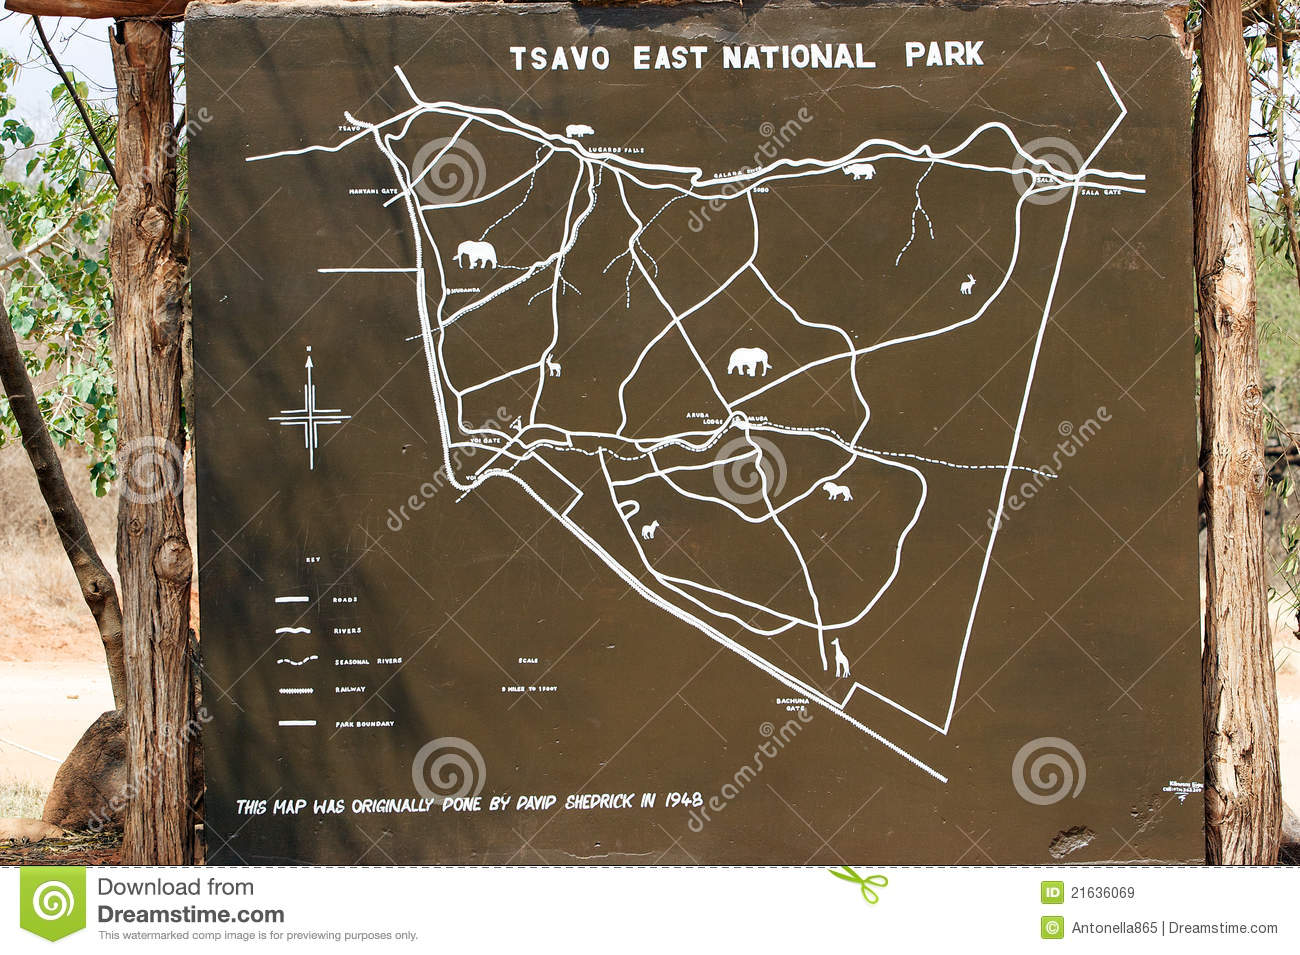 Tsavo East National Park Map Editorial Stock Image.